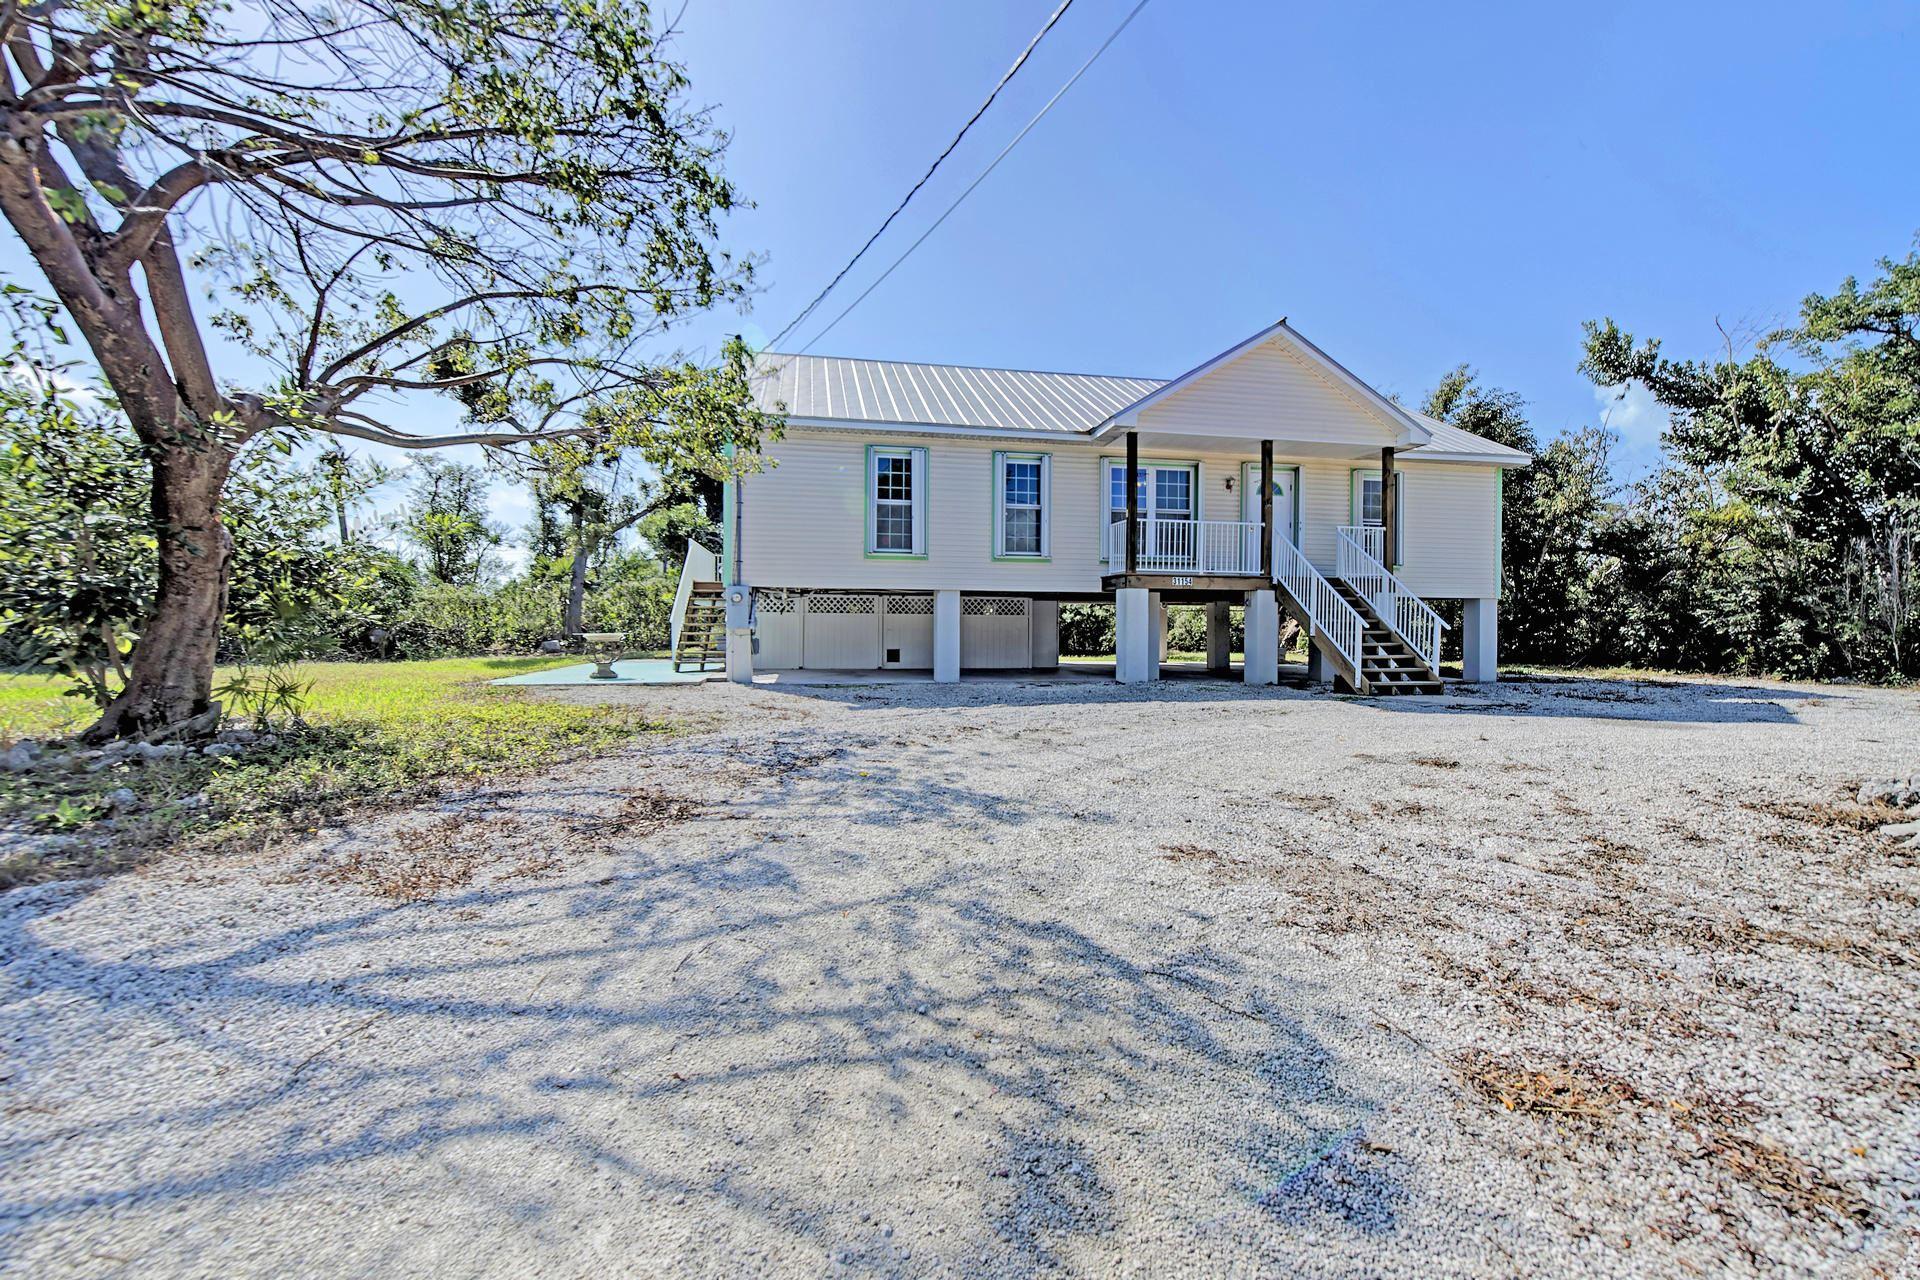 31154 Avenue D, Big Pine, FL 33043 - #: 594617